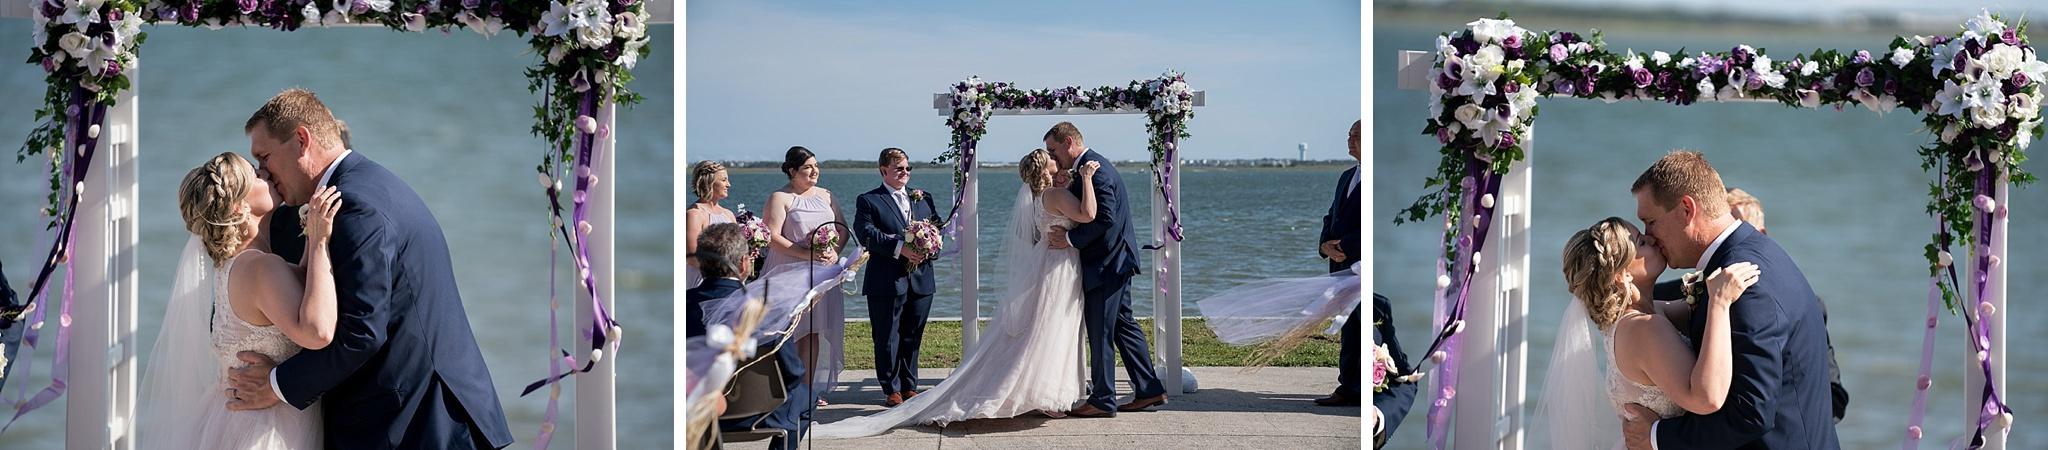 Crystal-Coast-Wedding-Photographer-024.jpg